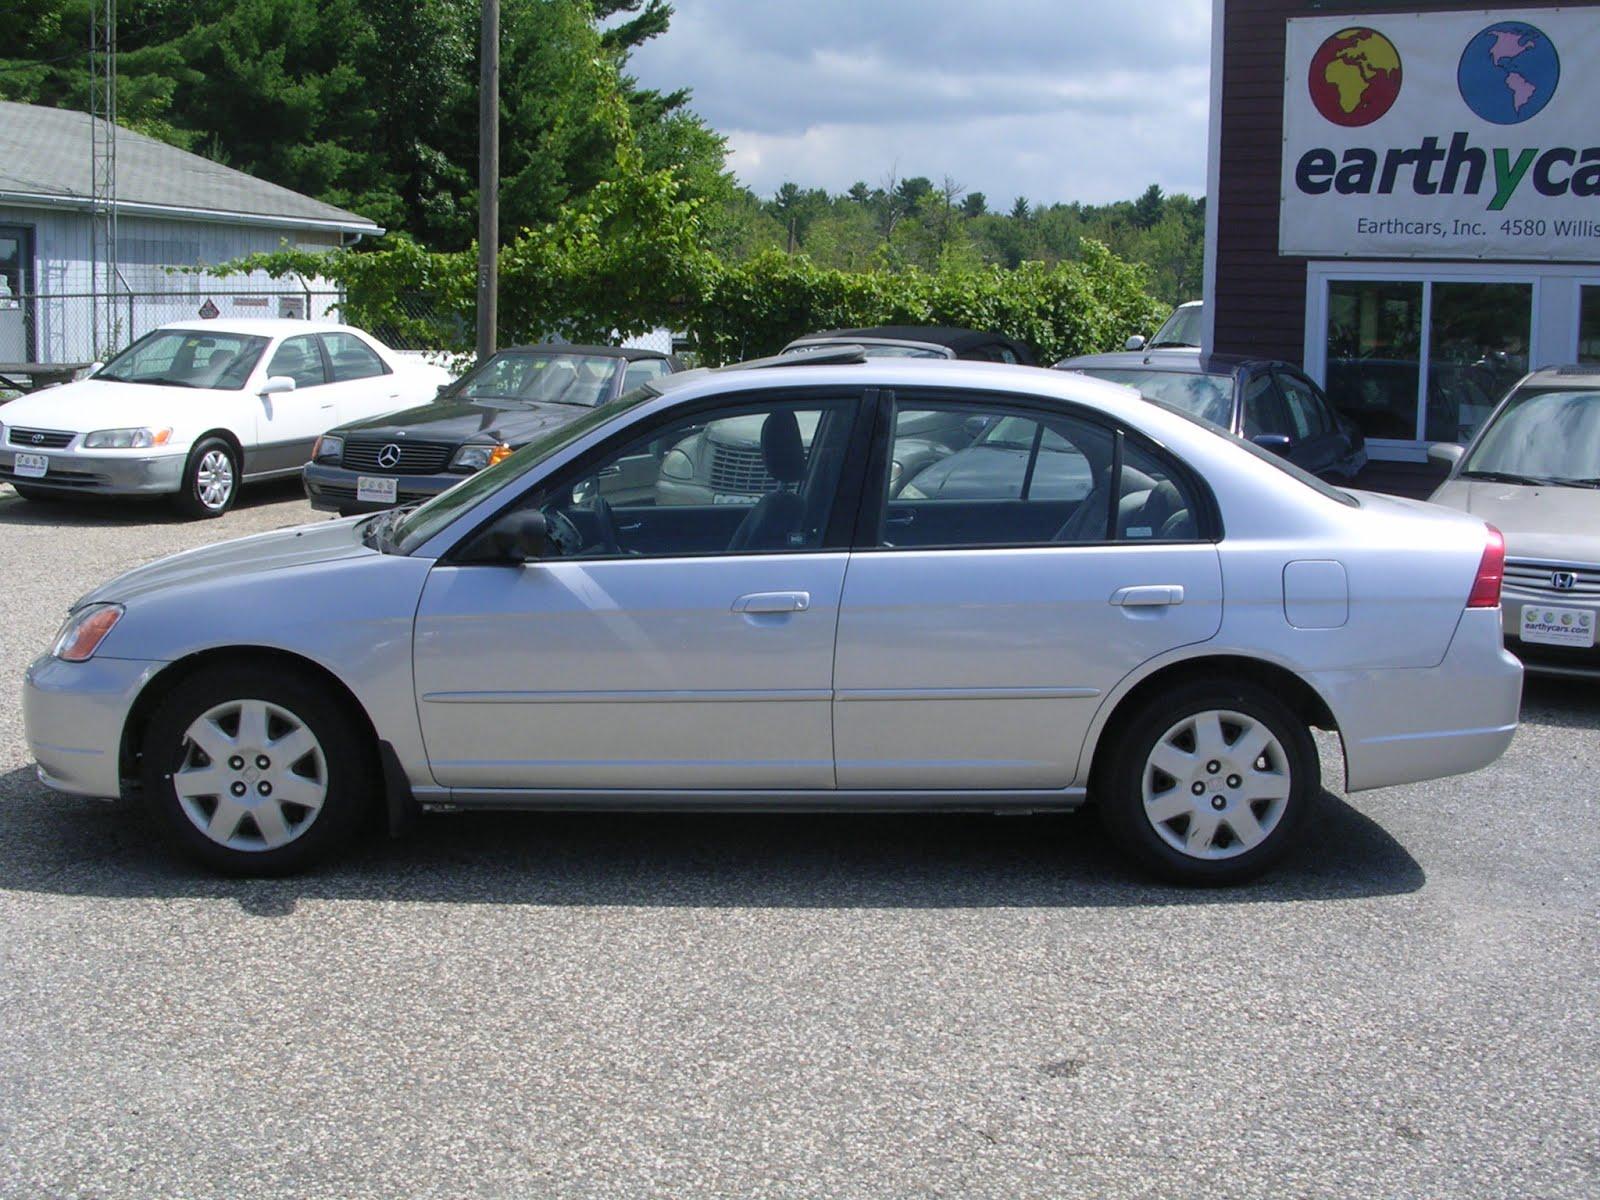 Earthy Cars Blog: EARTHY CARS SPOTLIGHT: 08.29.2012 (BACK TO SCHOOL ...